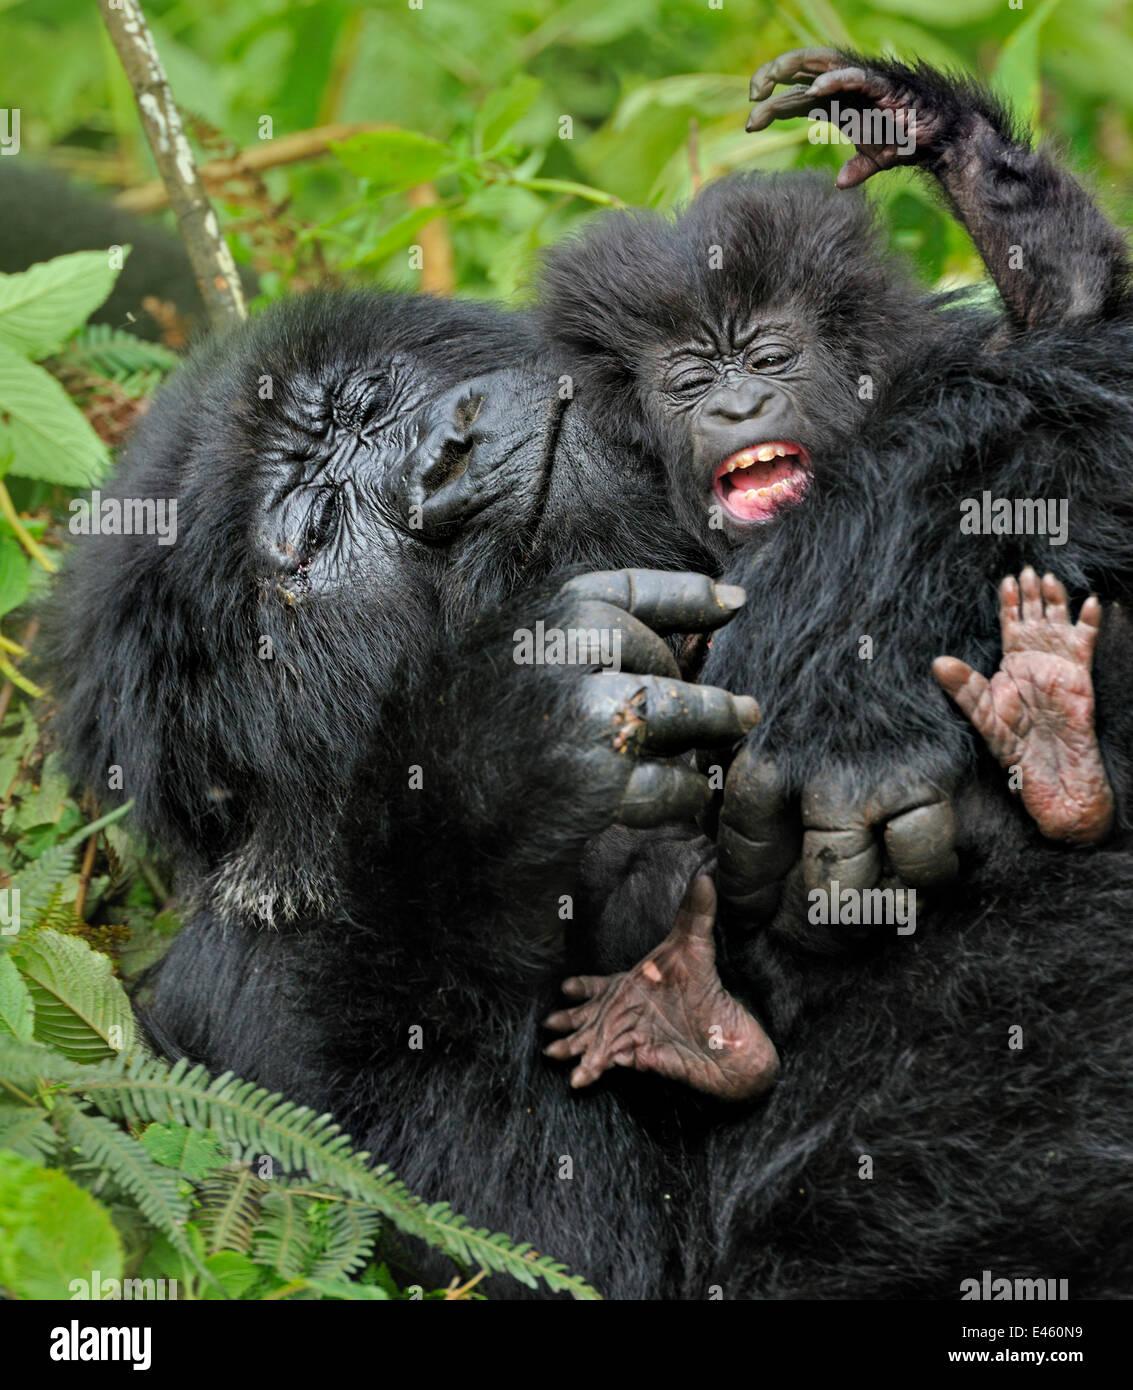 Mountain Gorilla (Gorilla beringei) adult playing with an infant. Rwanda, Africa Stock Photo